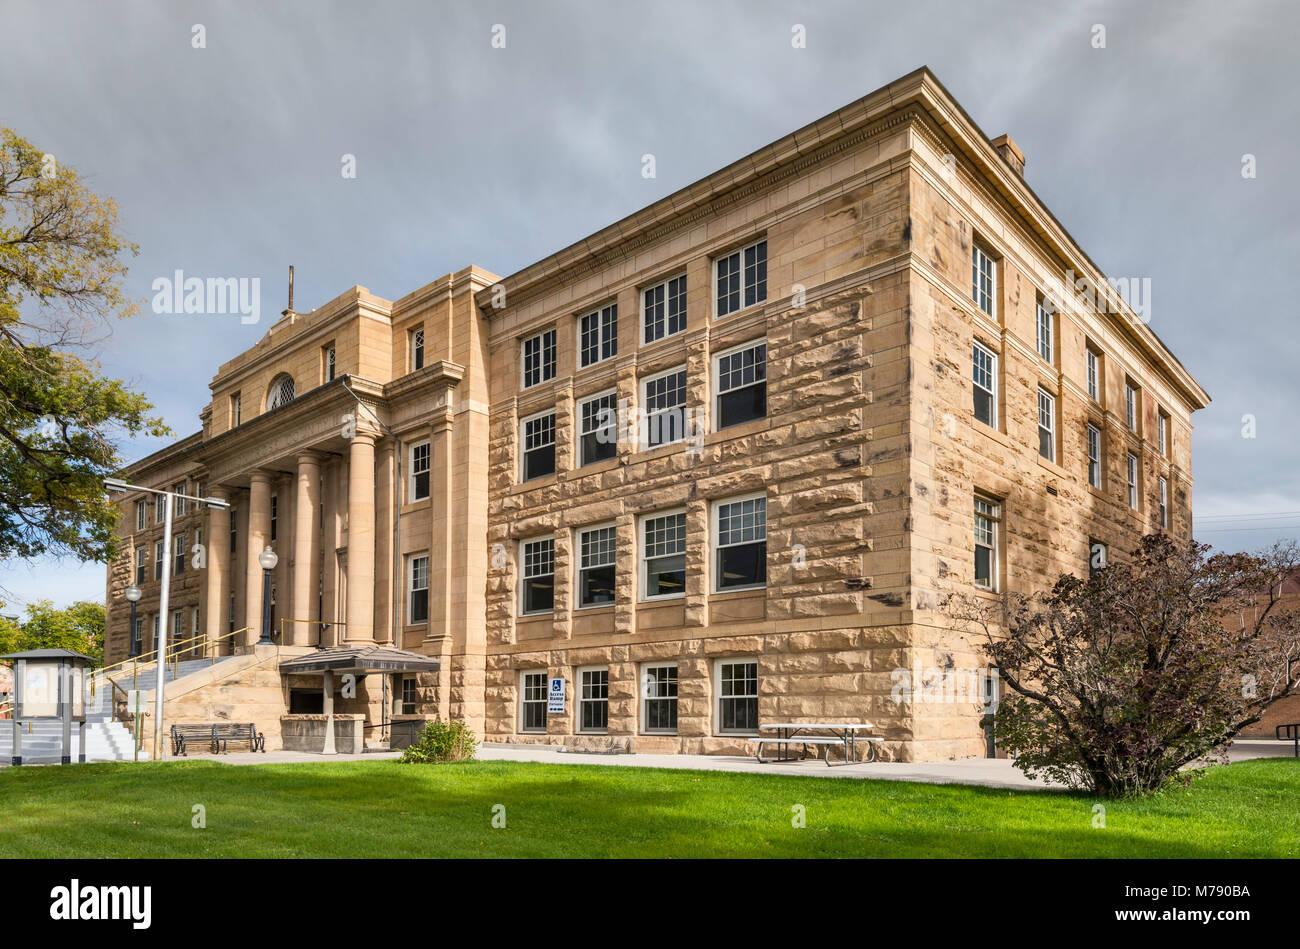 Small Town Courthouse Stock Photos & Small Town Courthouse Stock ...